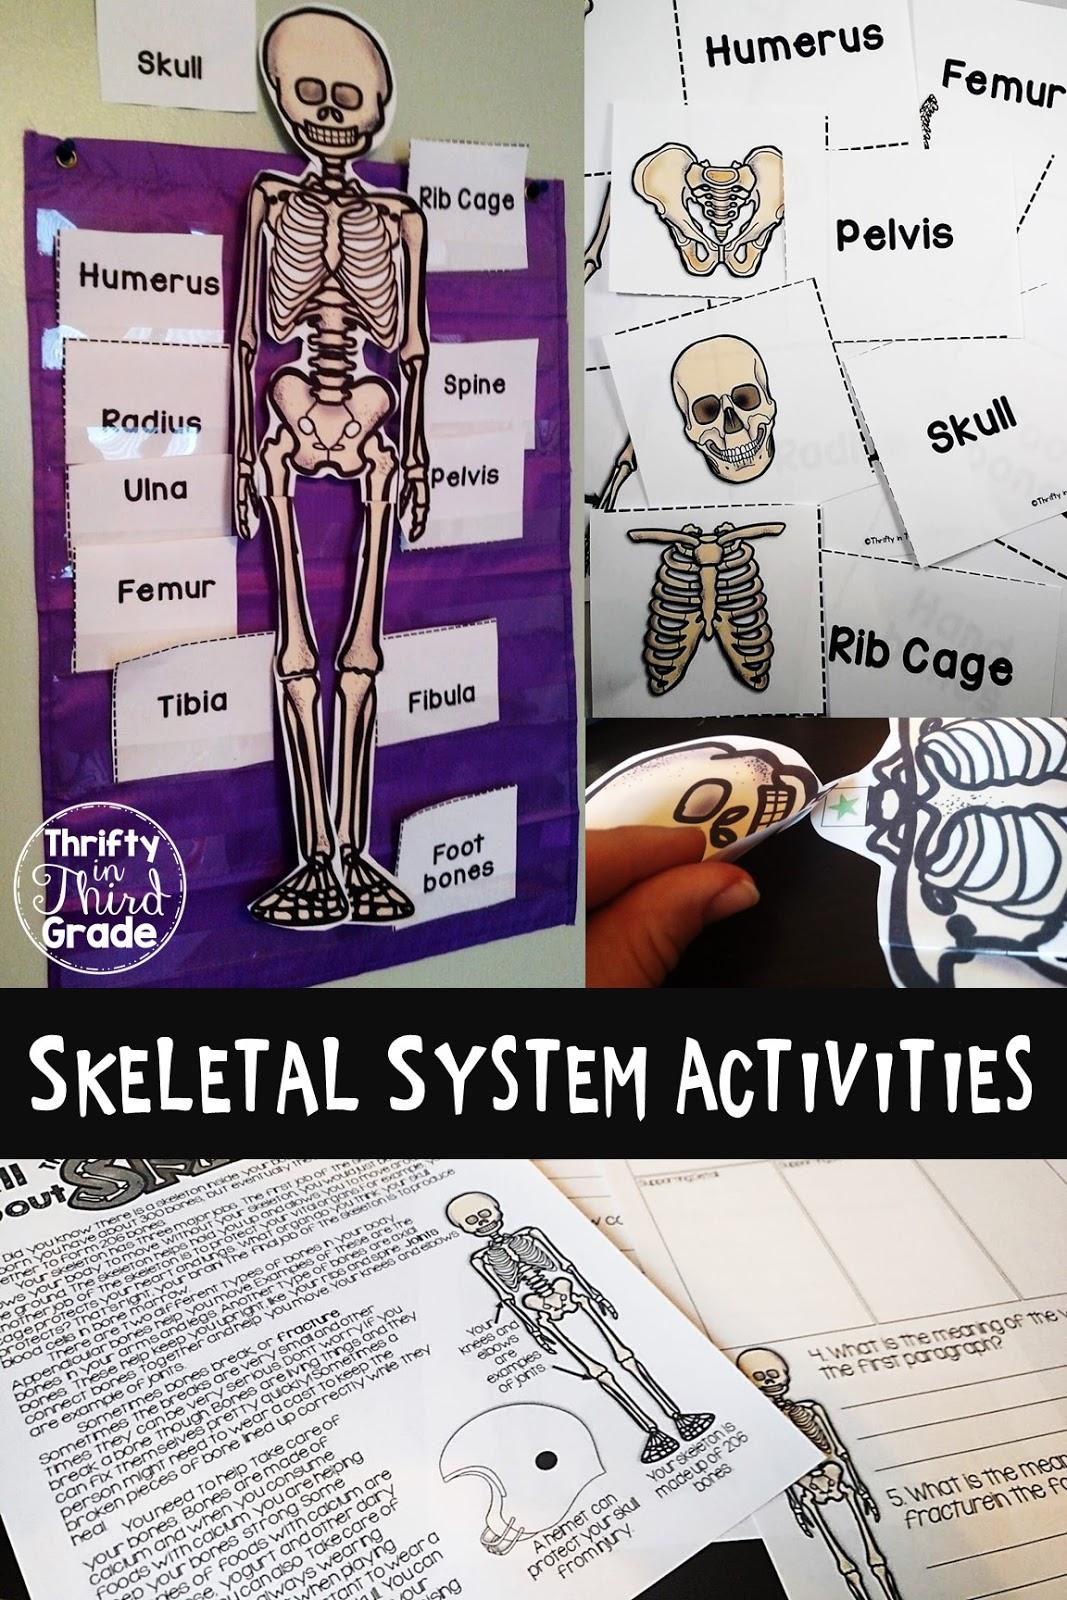 Skeletal System Thrifty In Third Grade